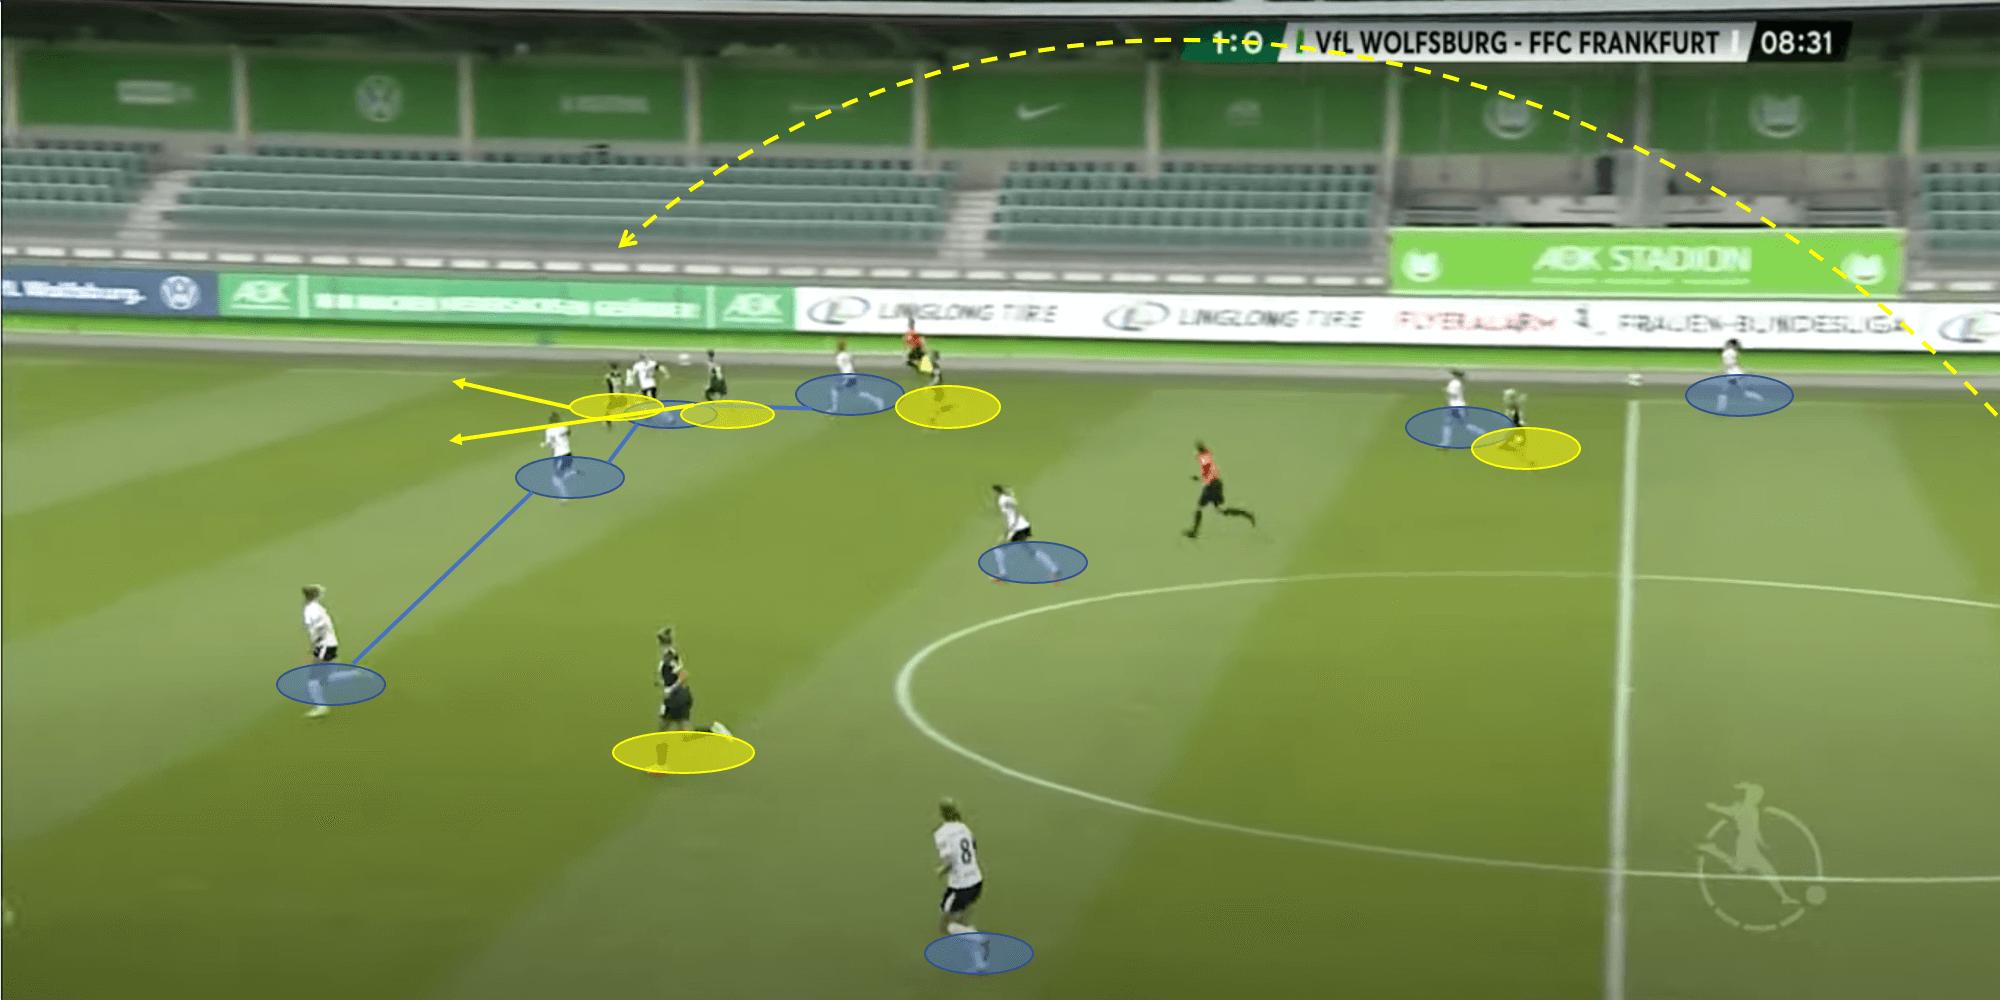 Frauen Bundesliga 2019/20: Wolfsburg vs FFC Frankfurt - tactical analysis tactics